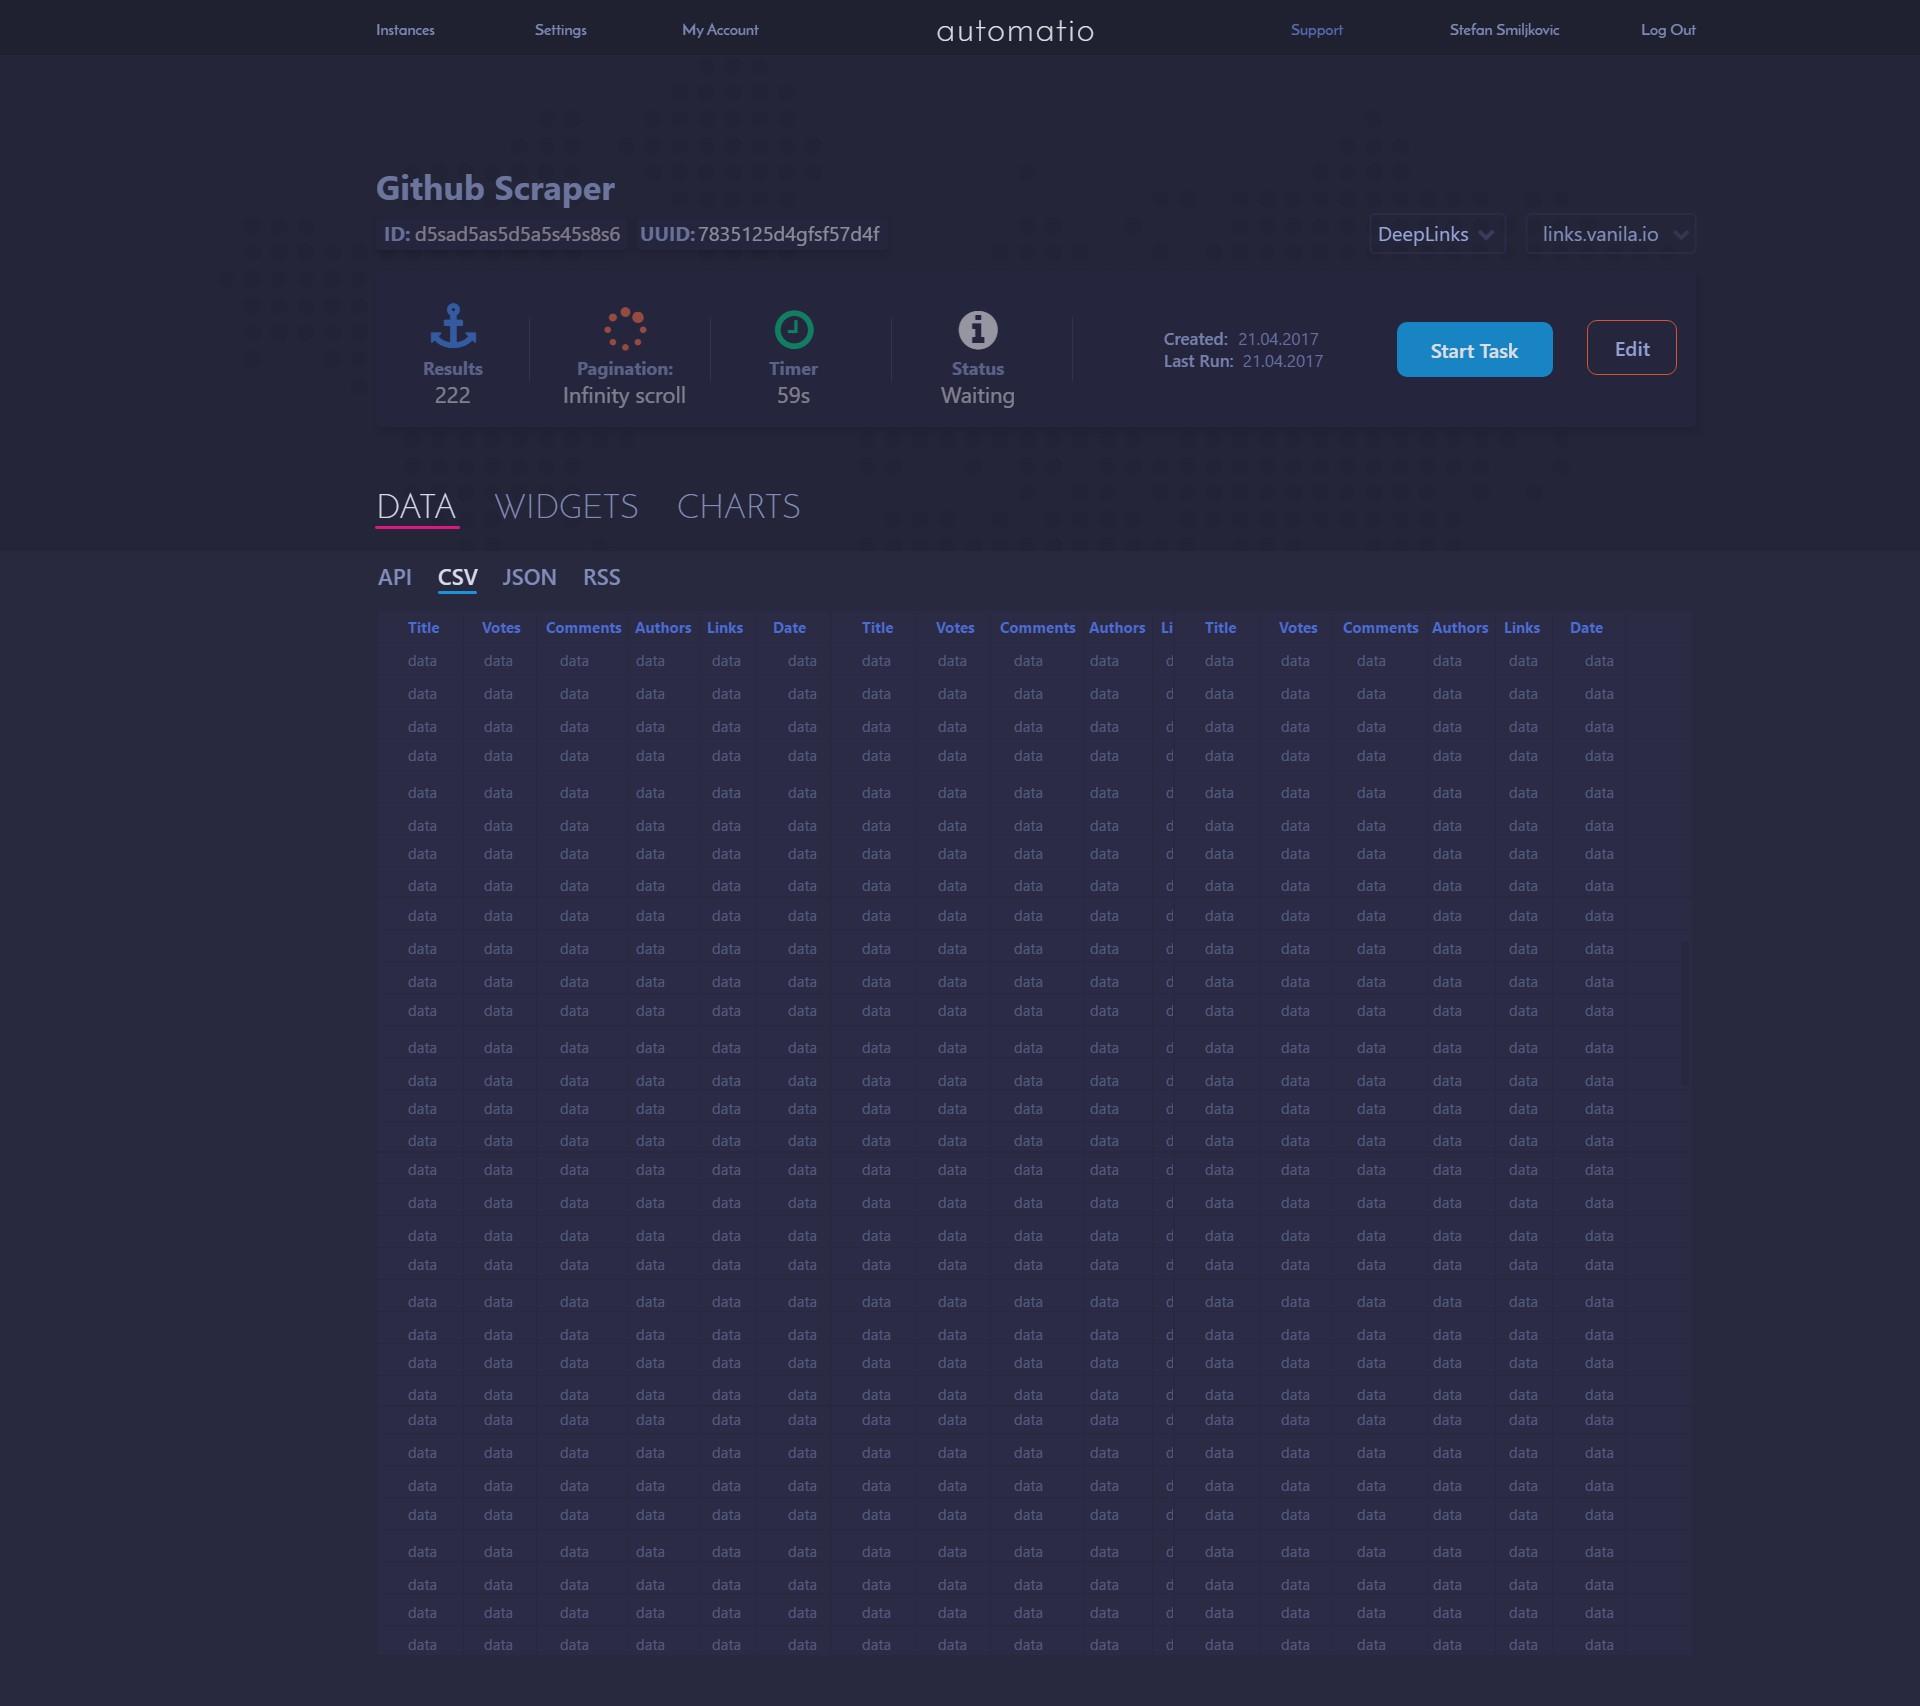 Automatio - Web Monitoring, Data Mining | LinkedIn